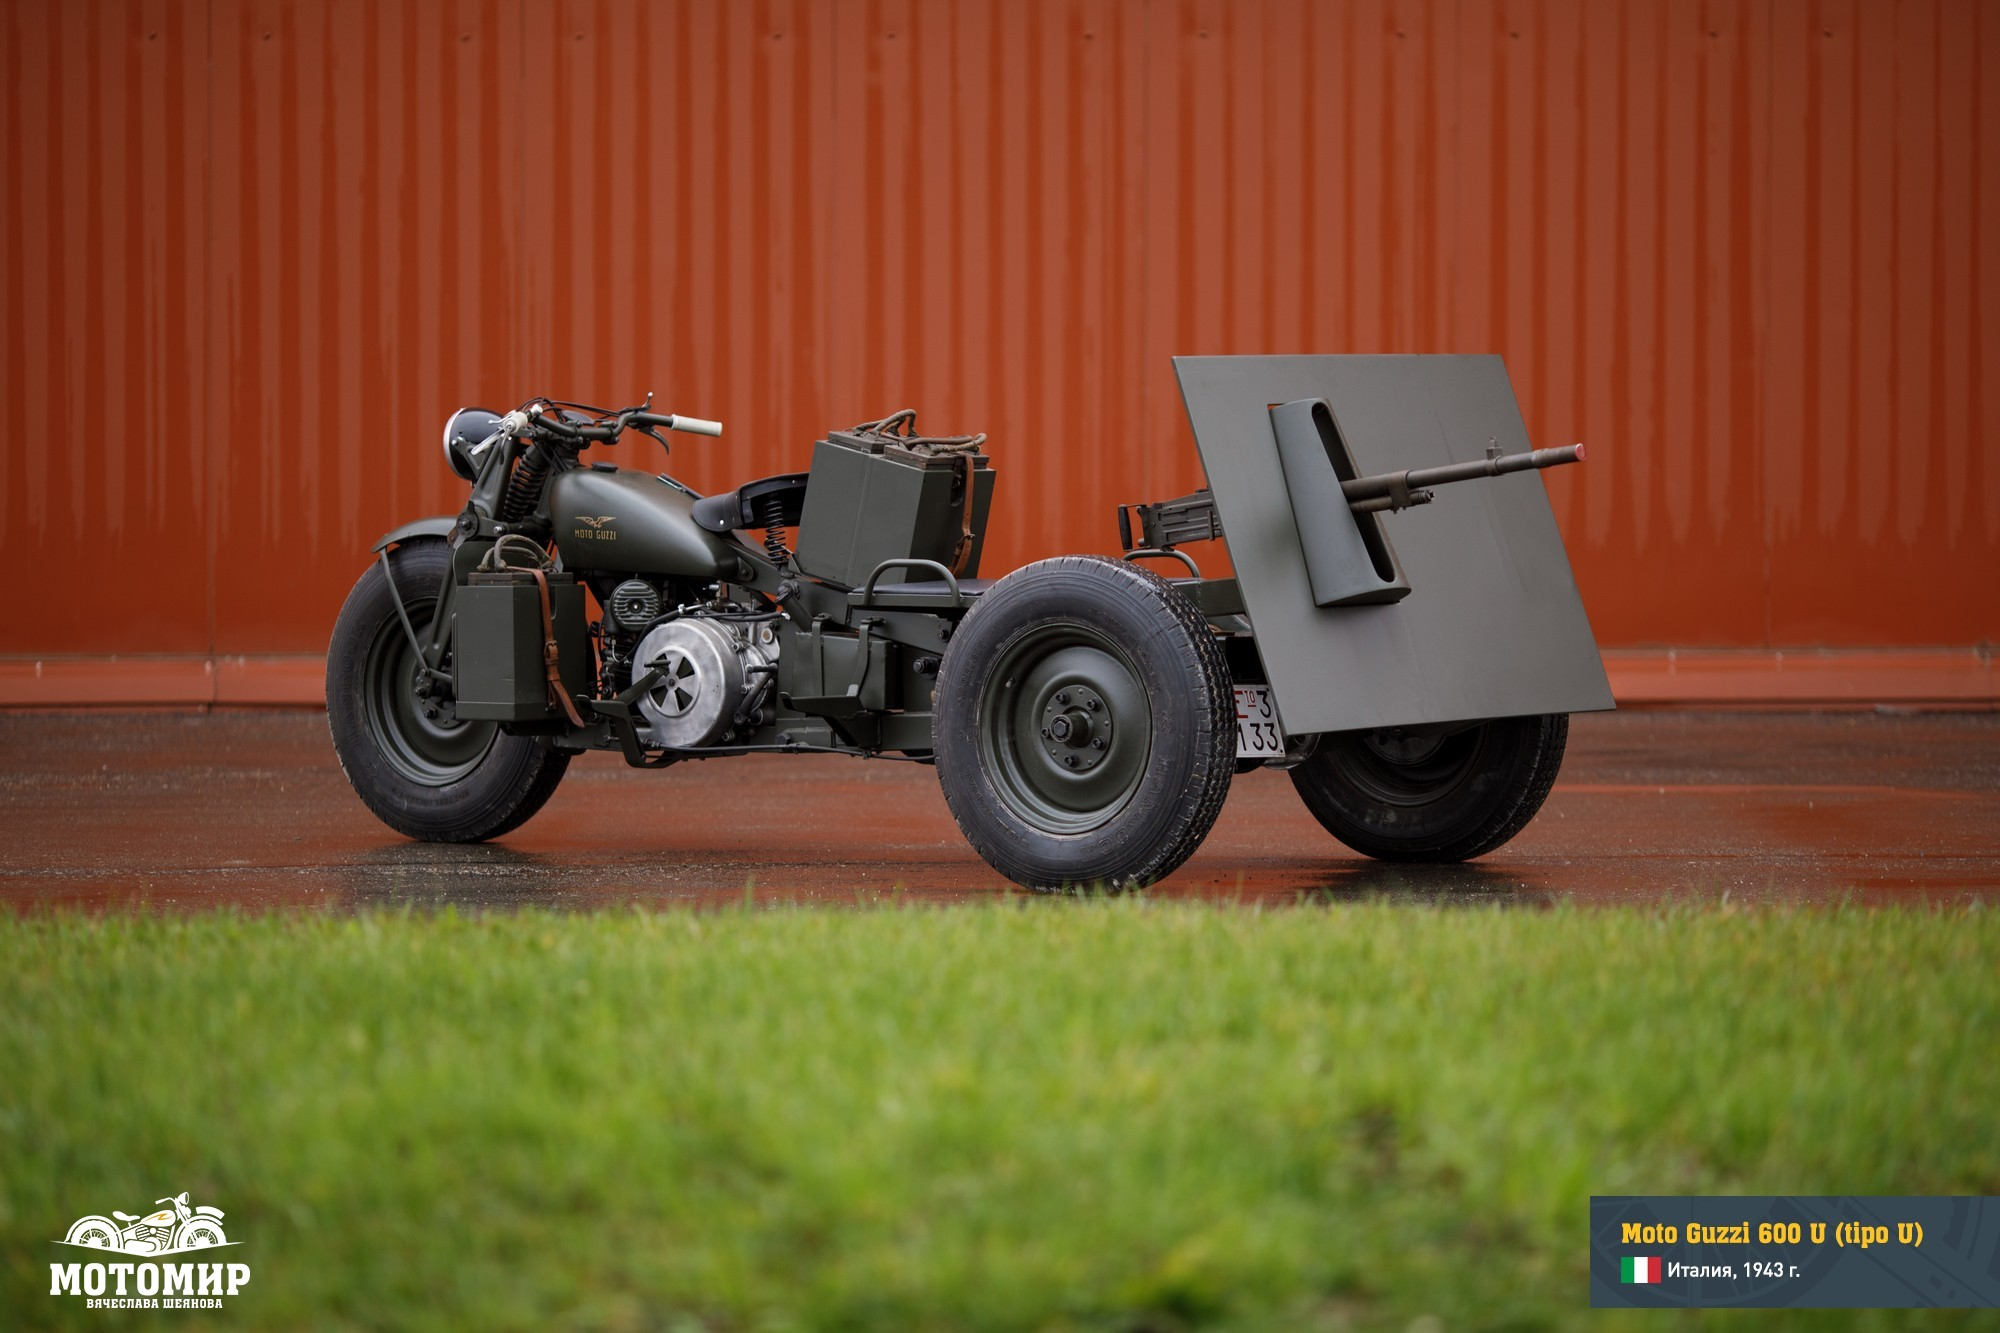 moto-guzzi-600-u-web-03